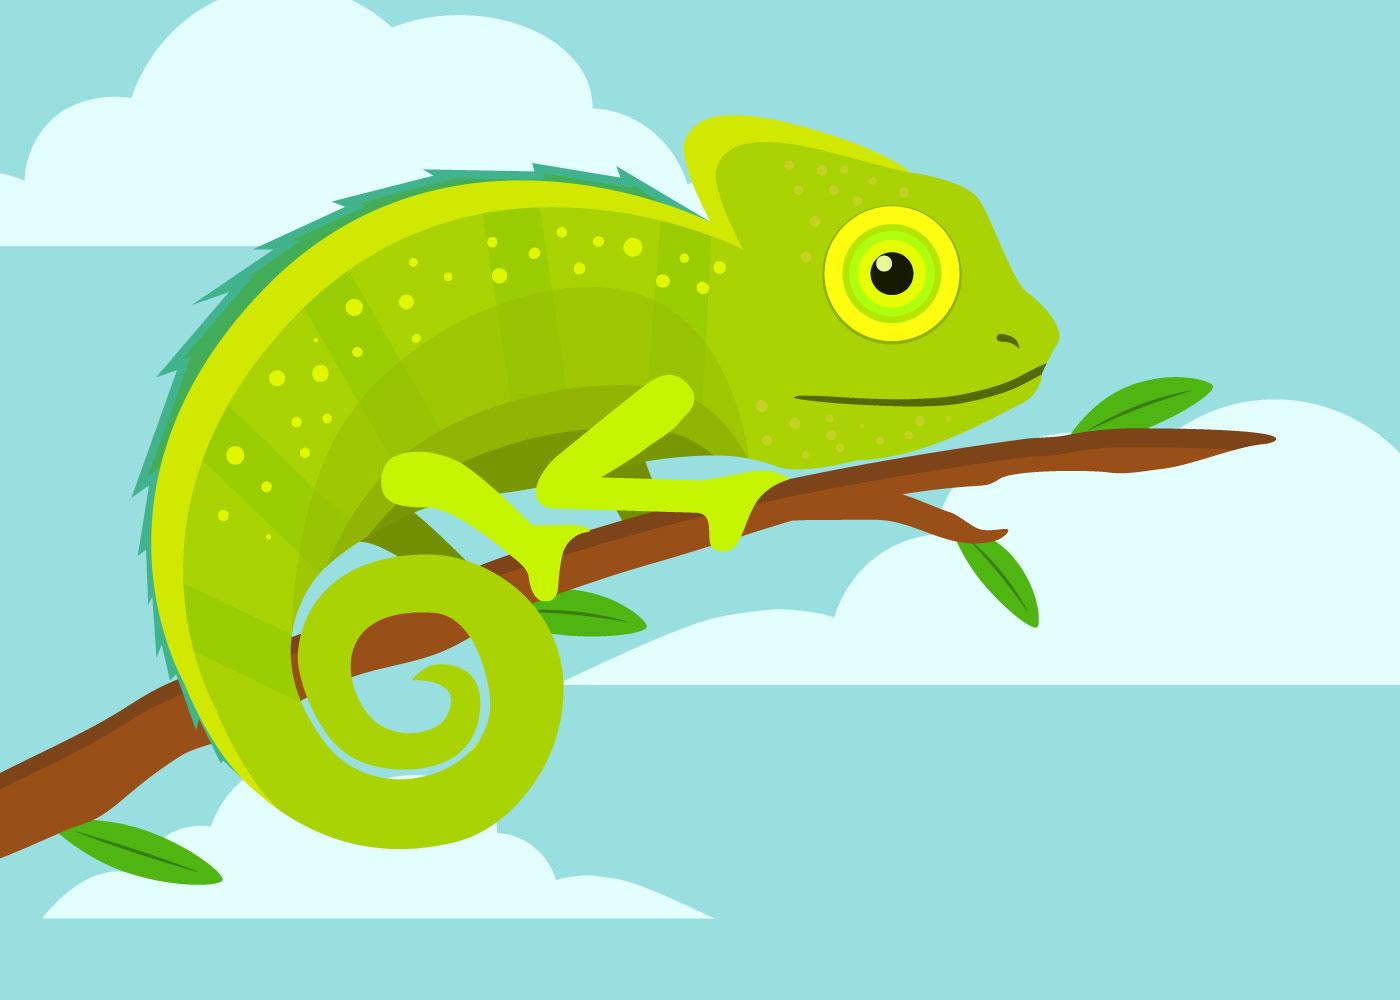 Colorless Funny Cartoon Scorpion Vector on Preschool Chameleon Art